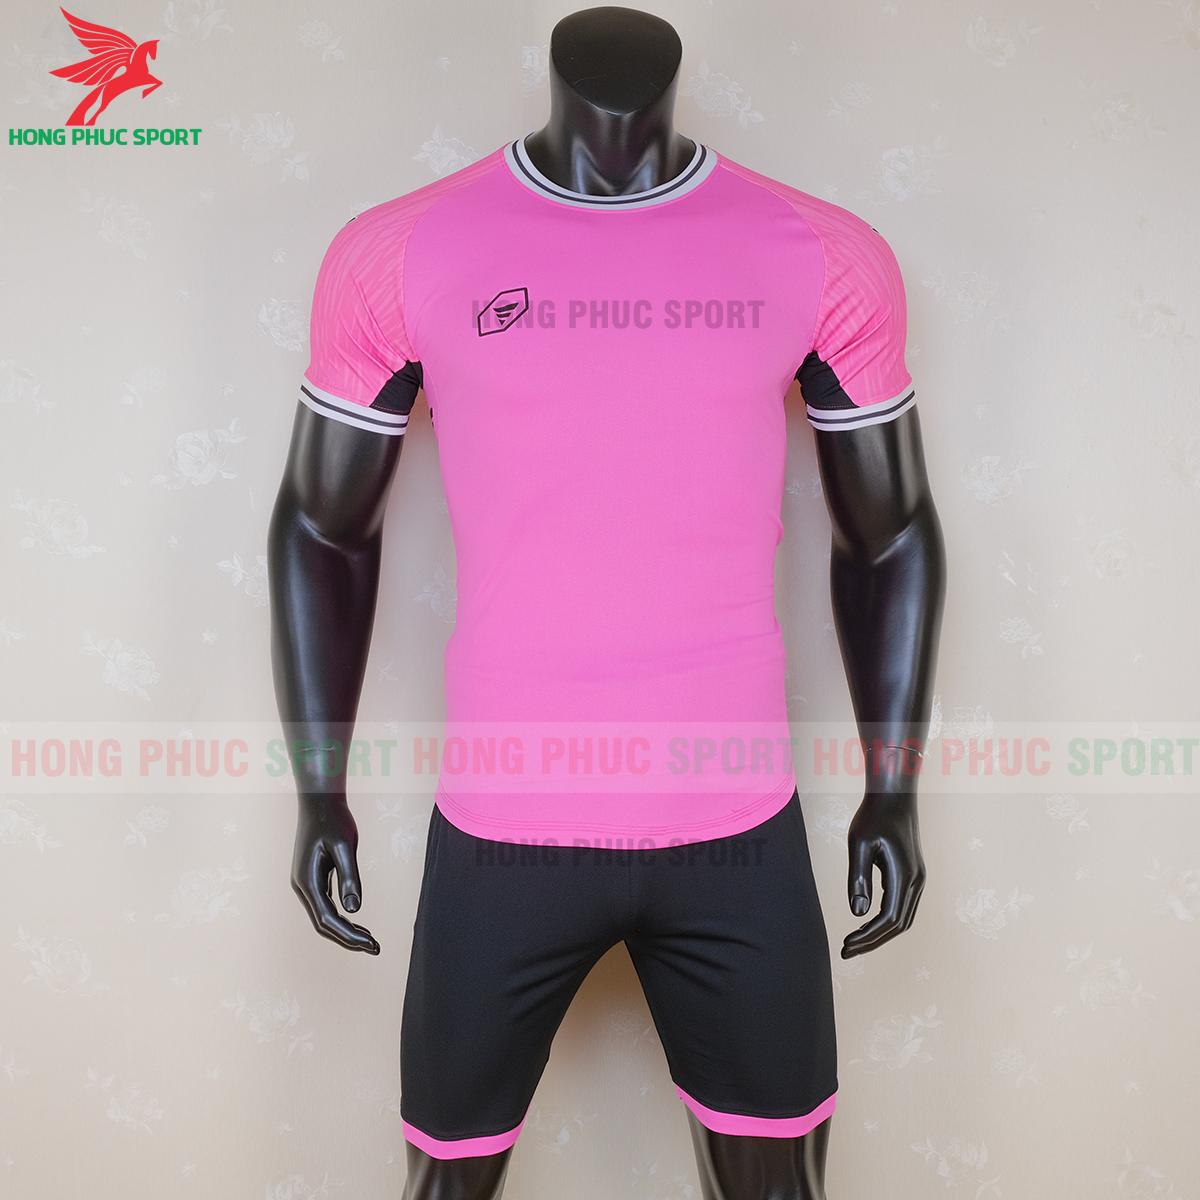 https://cdn.hongphucsport.com/unsafe/s4.shopbay.vn/files/285/ao-bong-da-khong-logo-ta-a06-mau-1-8-5f71bf88d81f8.png